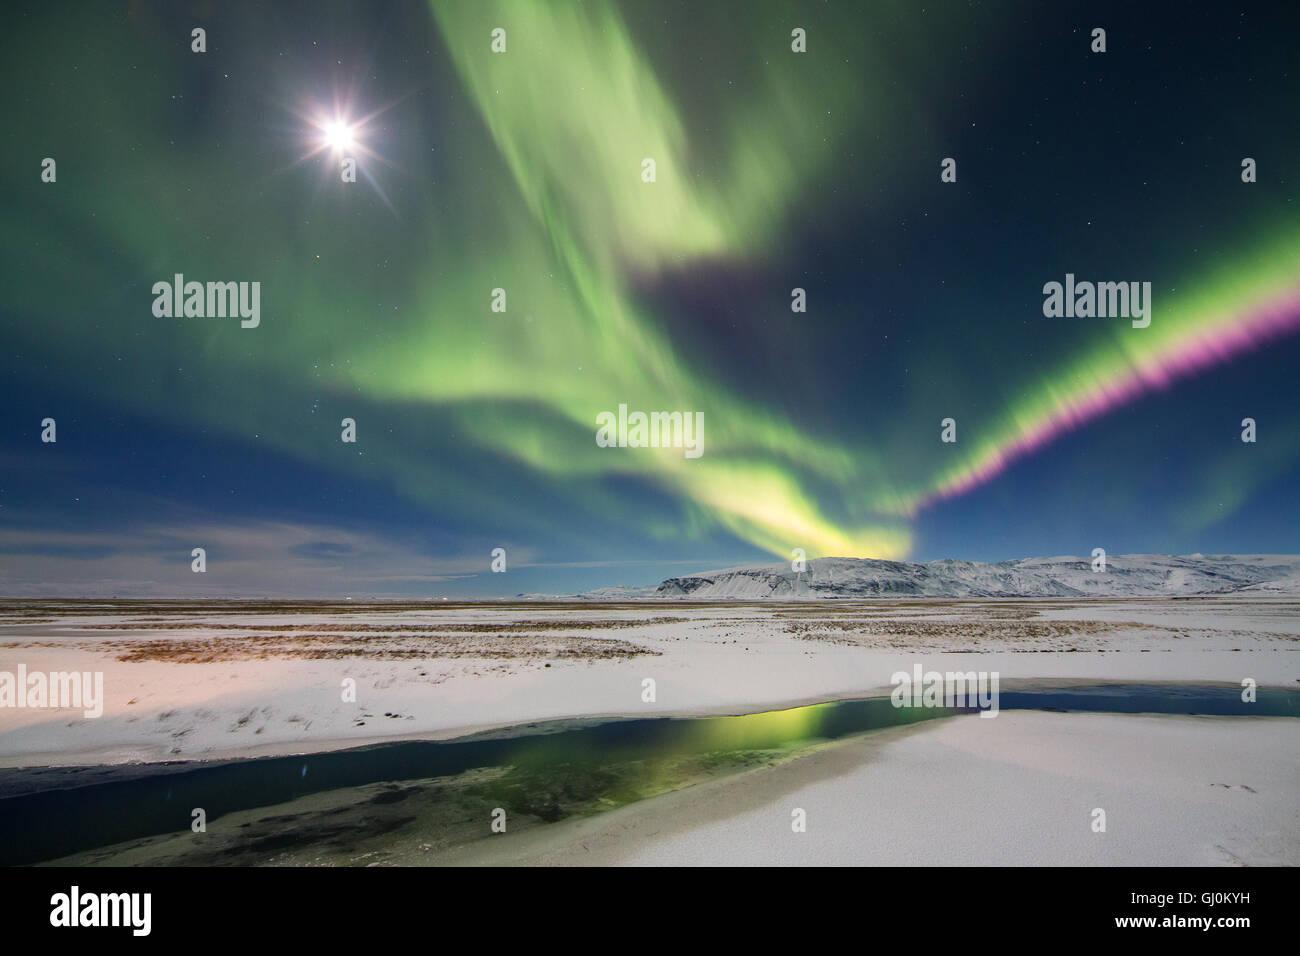 the Northern Lights (Aurora Borealis) over Hornafjörður, eastern Iceland - Stock Image